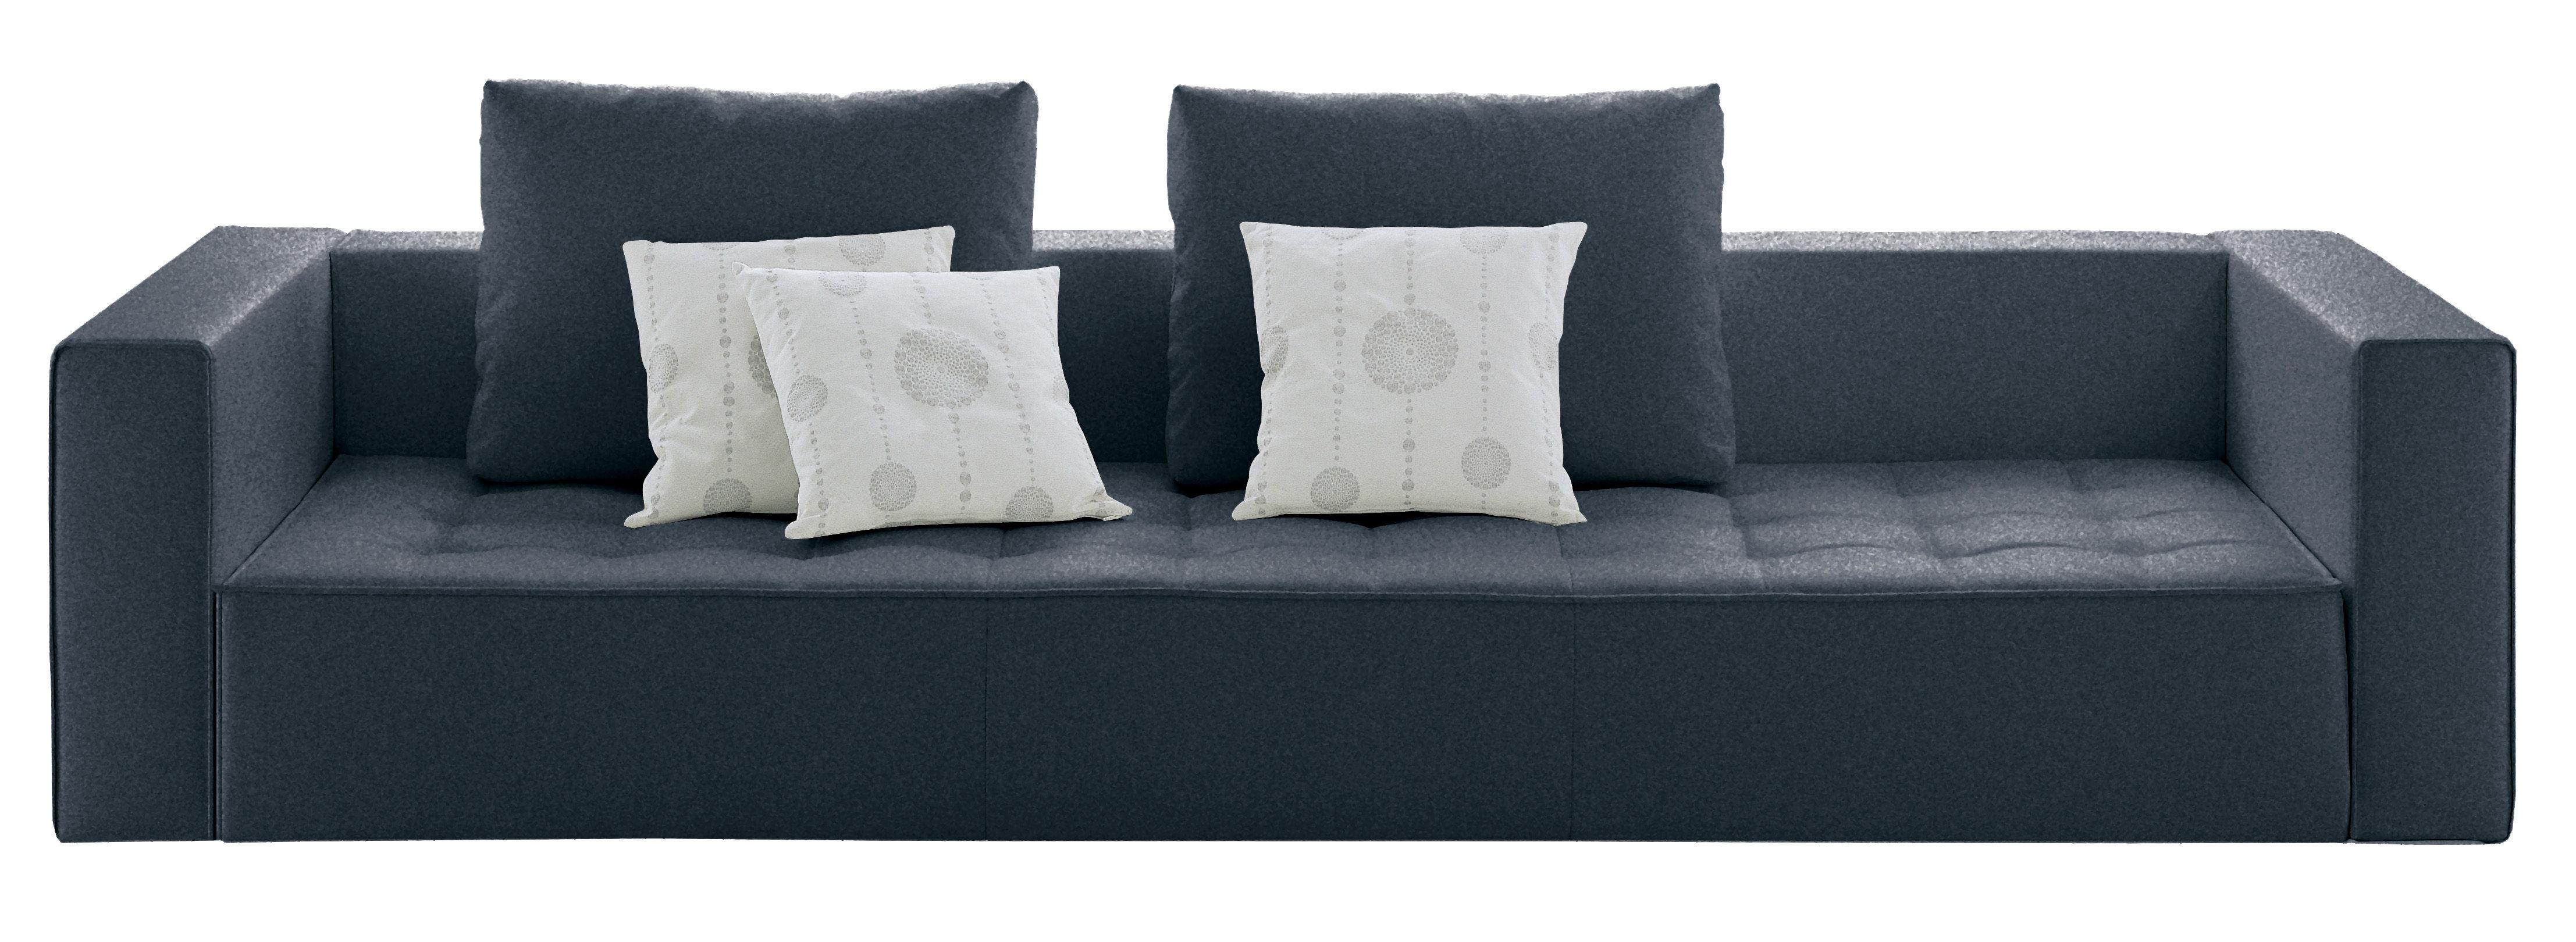 kilt stoff 3 sitzer zanotta sofa. Black Bedroom Furniture Sets. Home Design Ideas